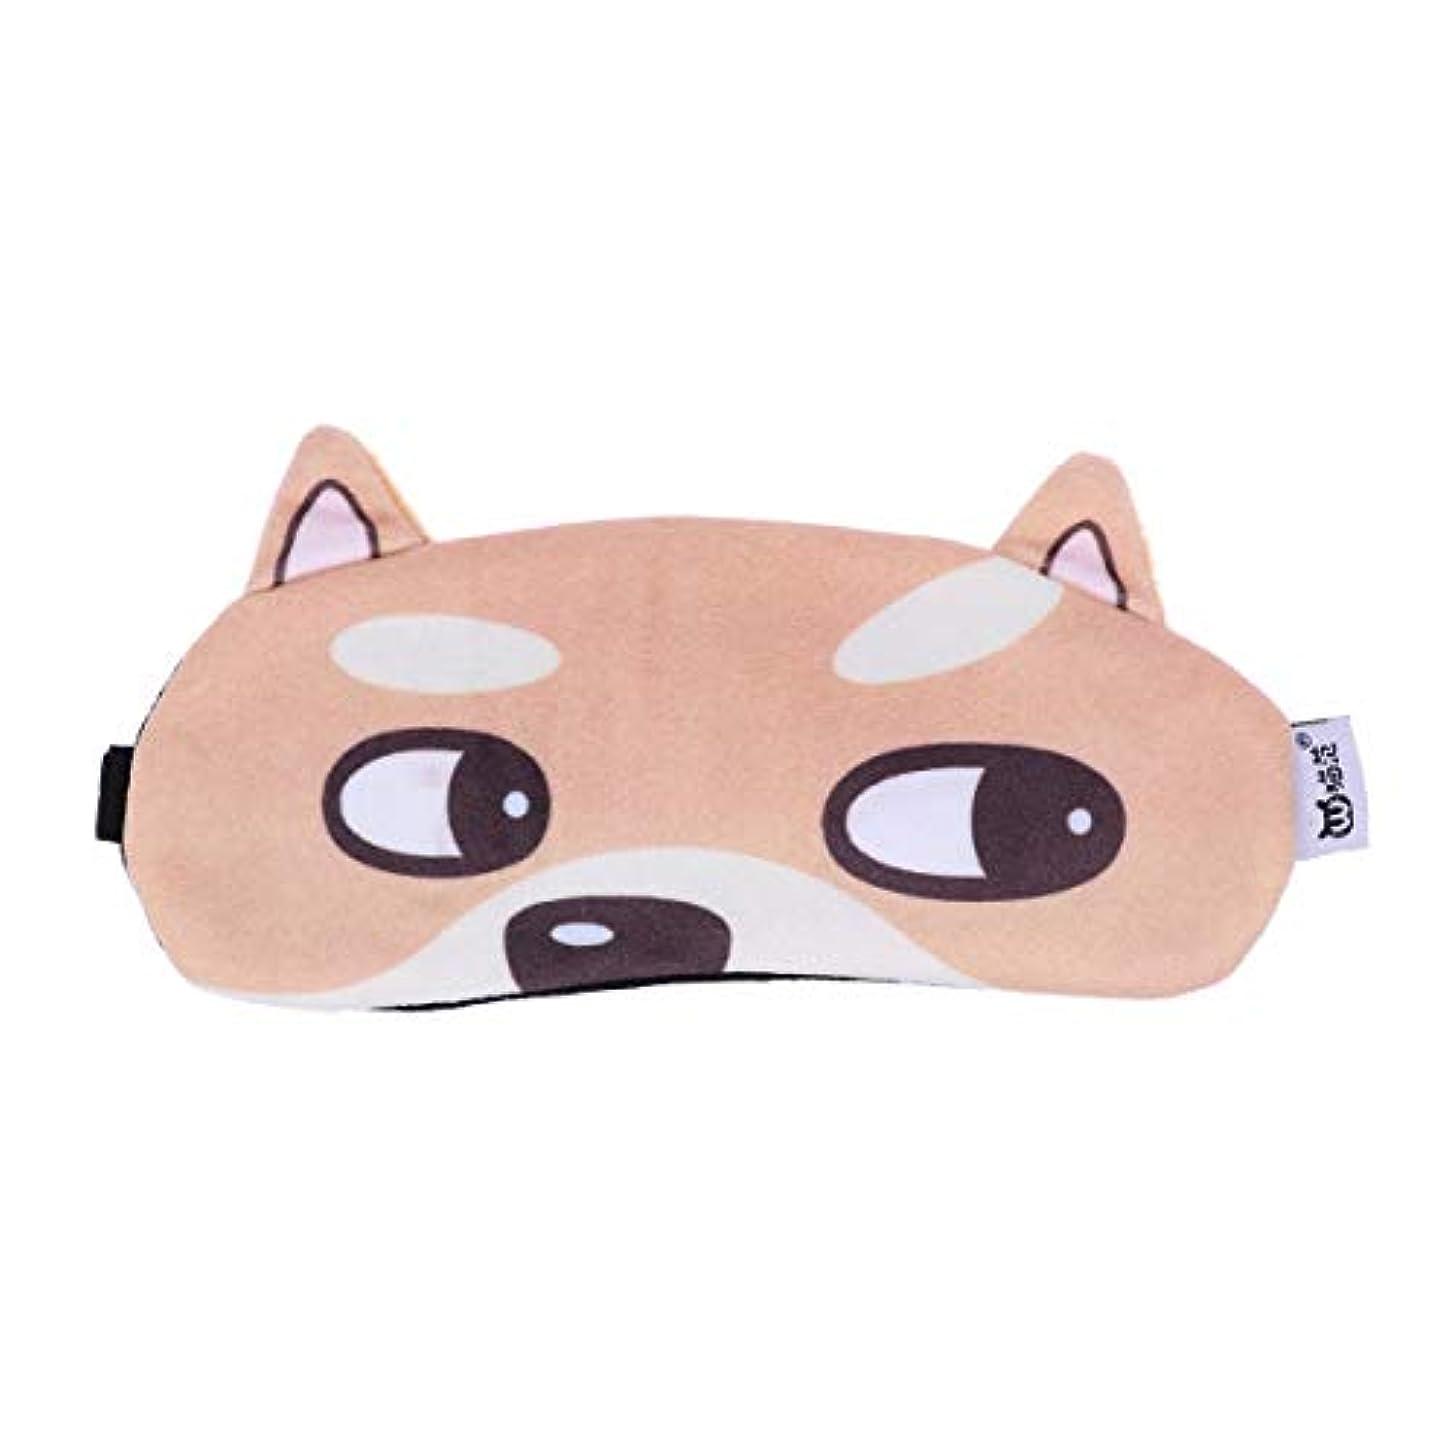 Healifty アイマスク ゲル アイスパッド アイスアイマスク 目隠し リラックス 冷却 パック 再使用可能 目の疲れ軽減 安眠 血行促進(犬)